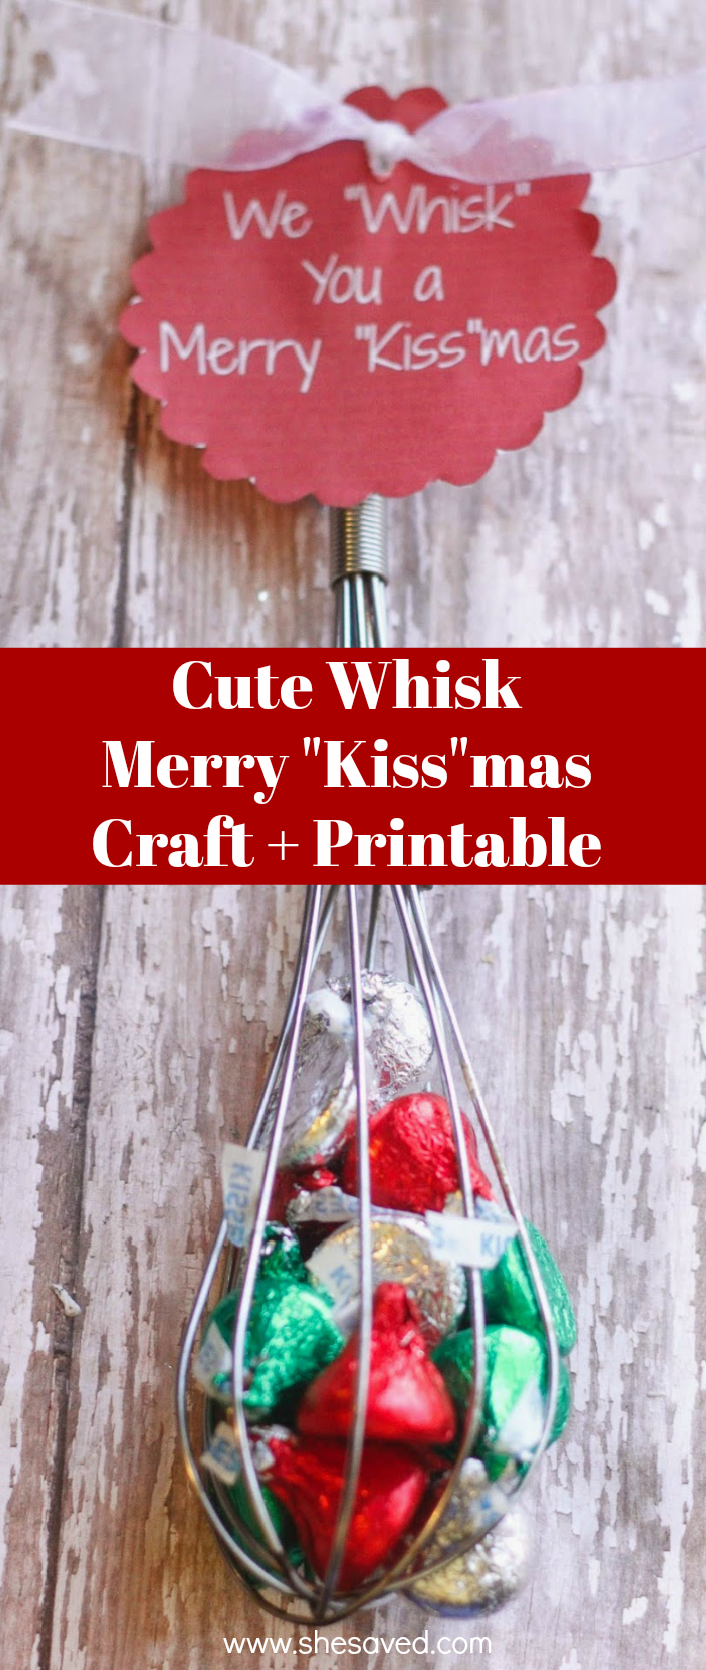 We Whisk You a Merry Kissmas Craft and Printable